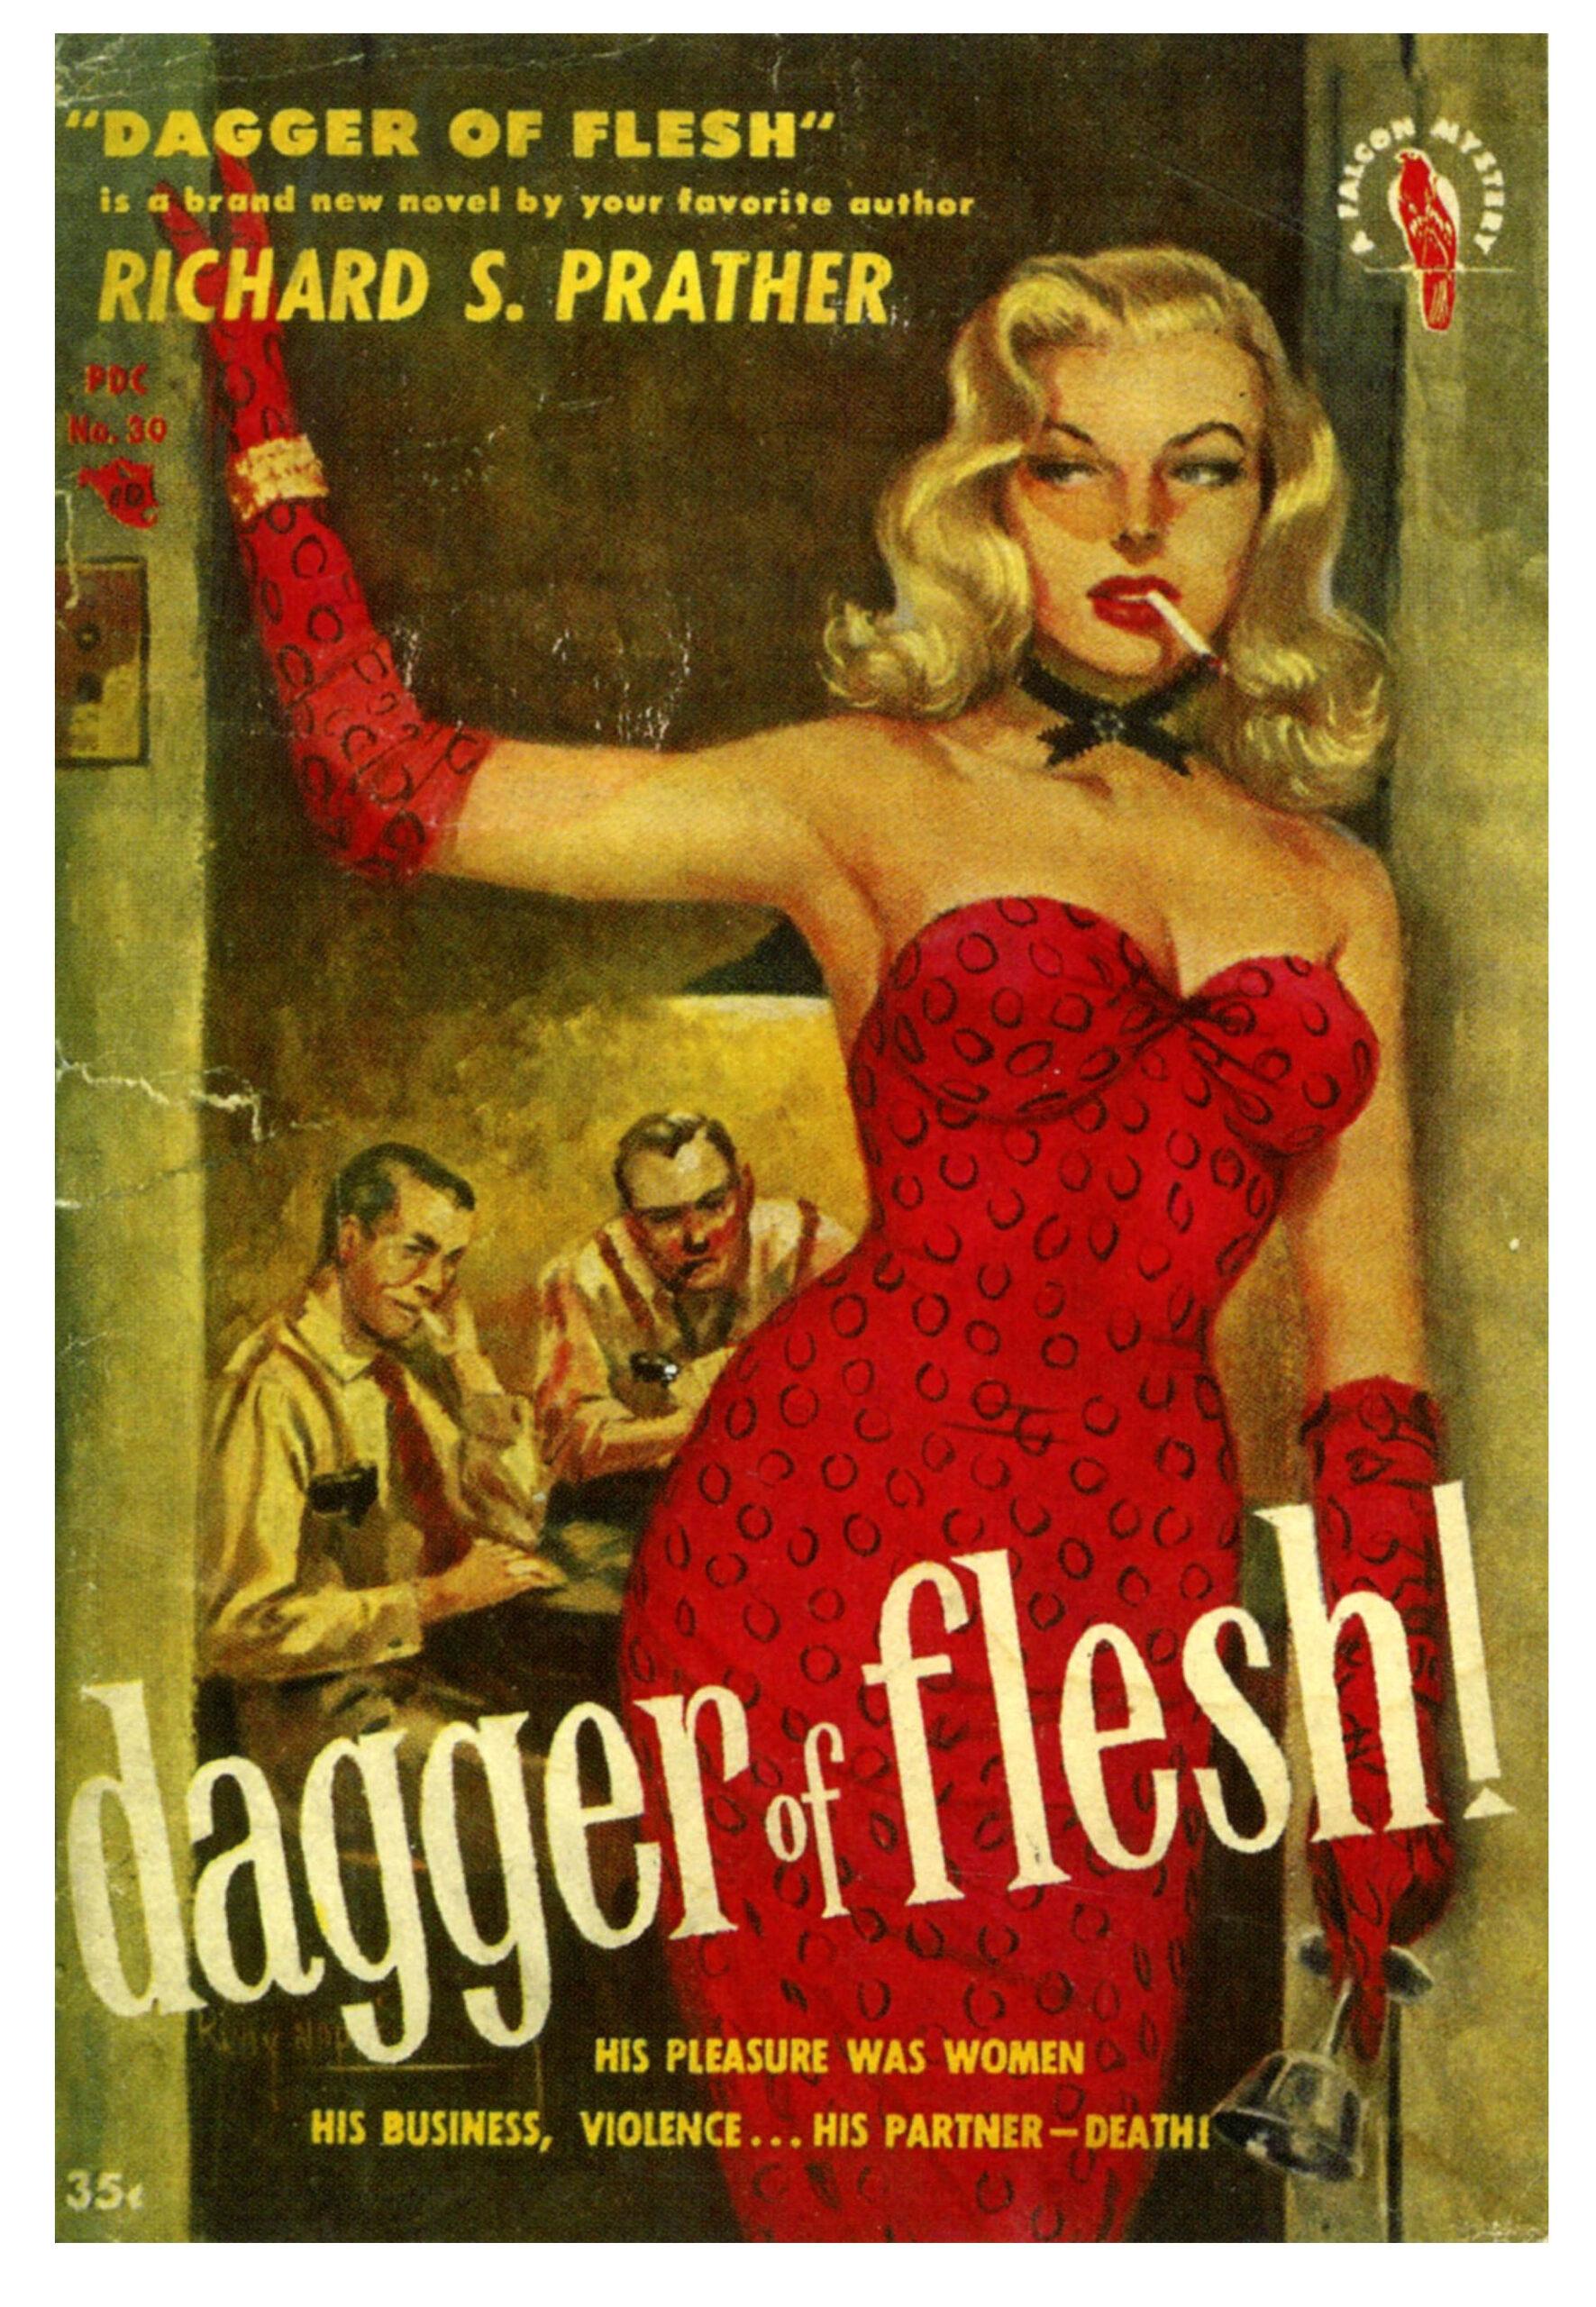 Ричард Пратер — Распятая плоть (1952)